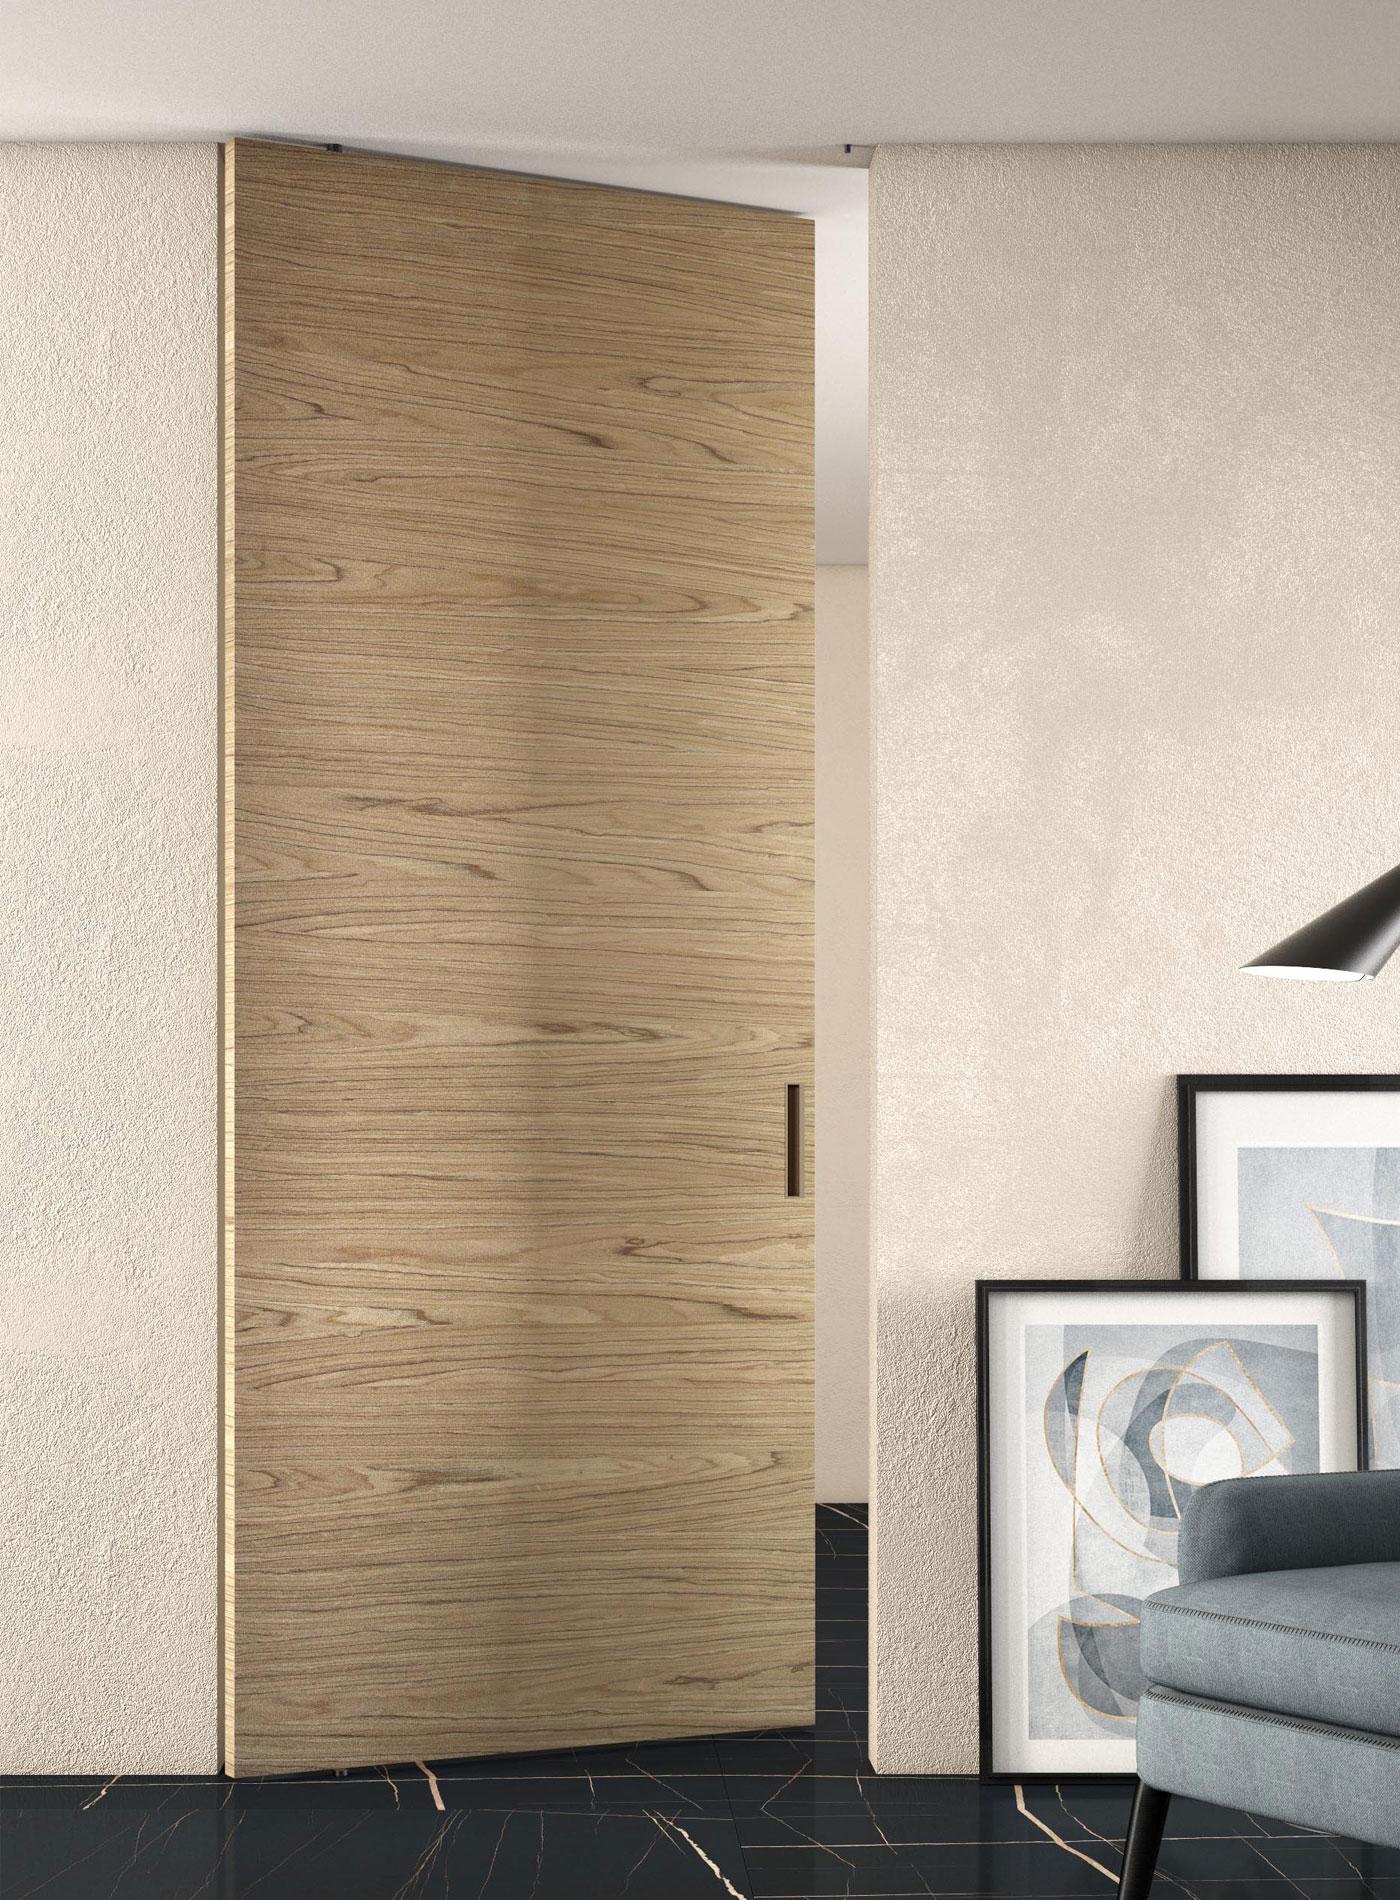 Planus Sei wooden panel